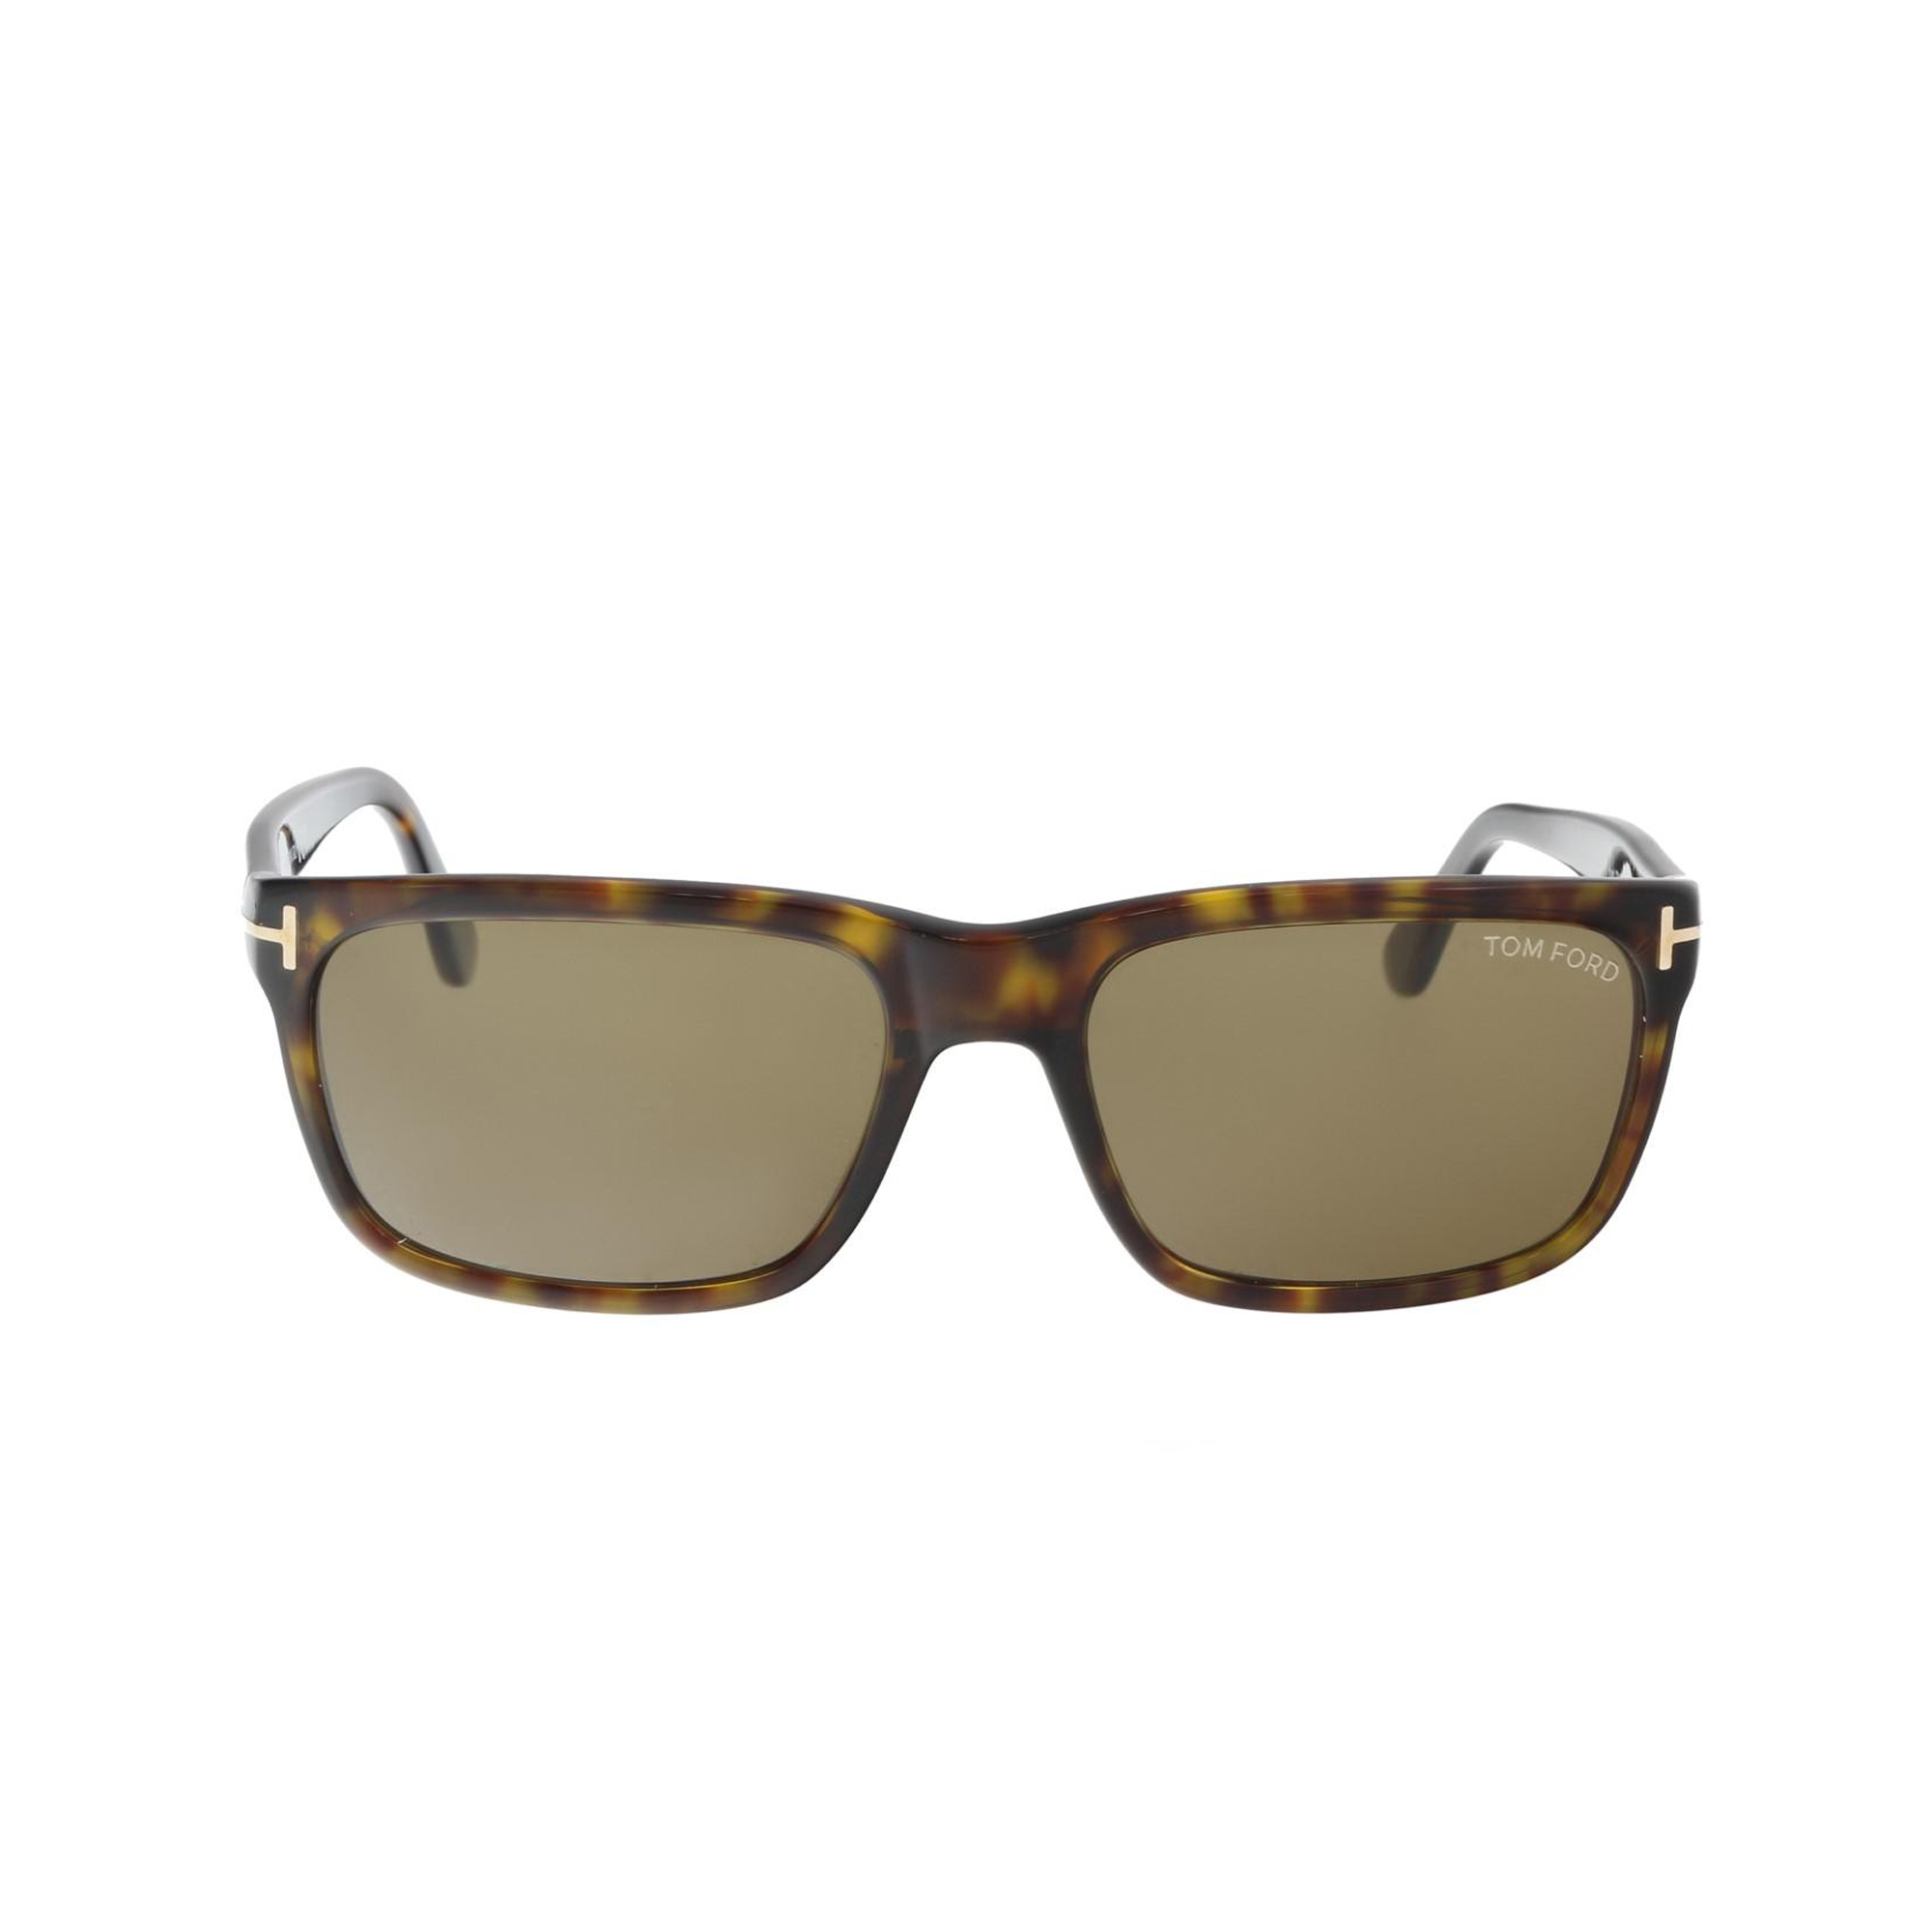 dcabec7838333 Hugh Sunglasses    Havana - Tom Ford - Touch of Modern